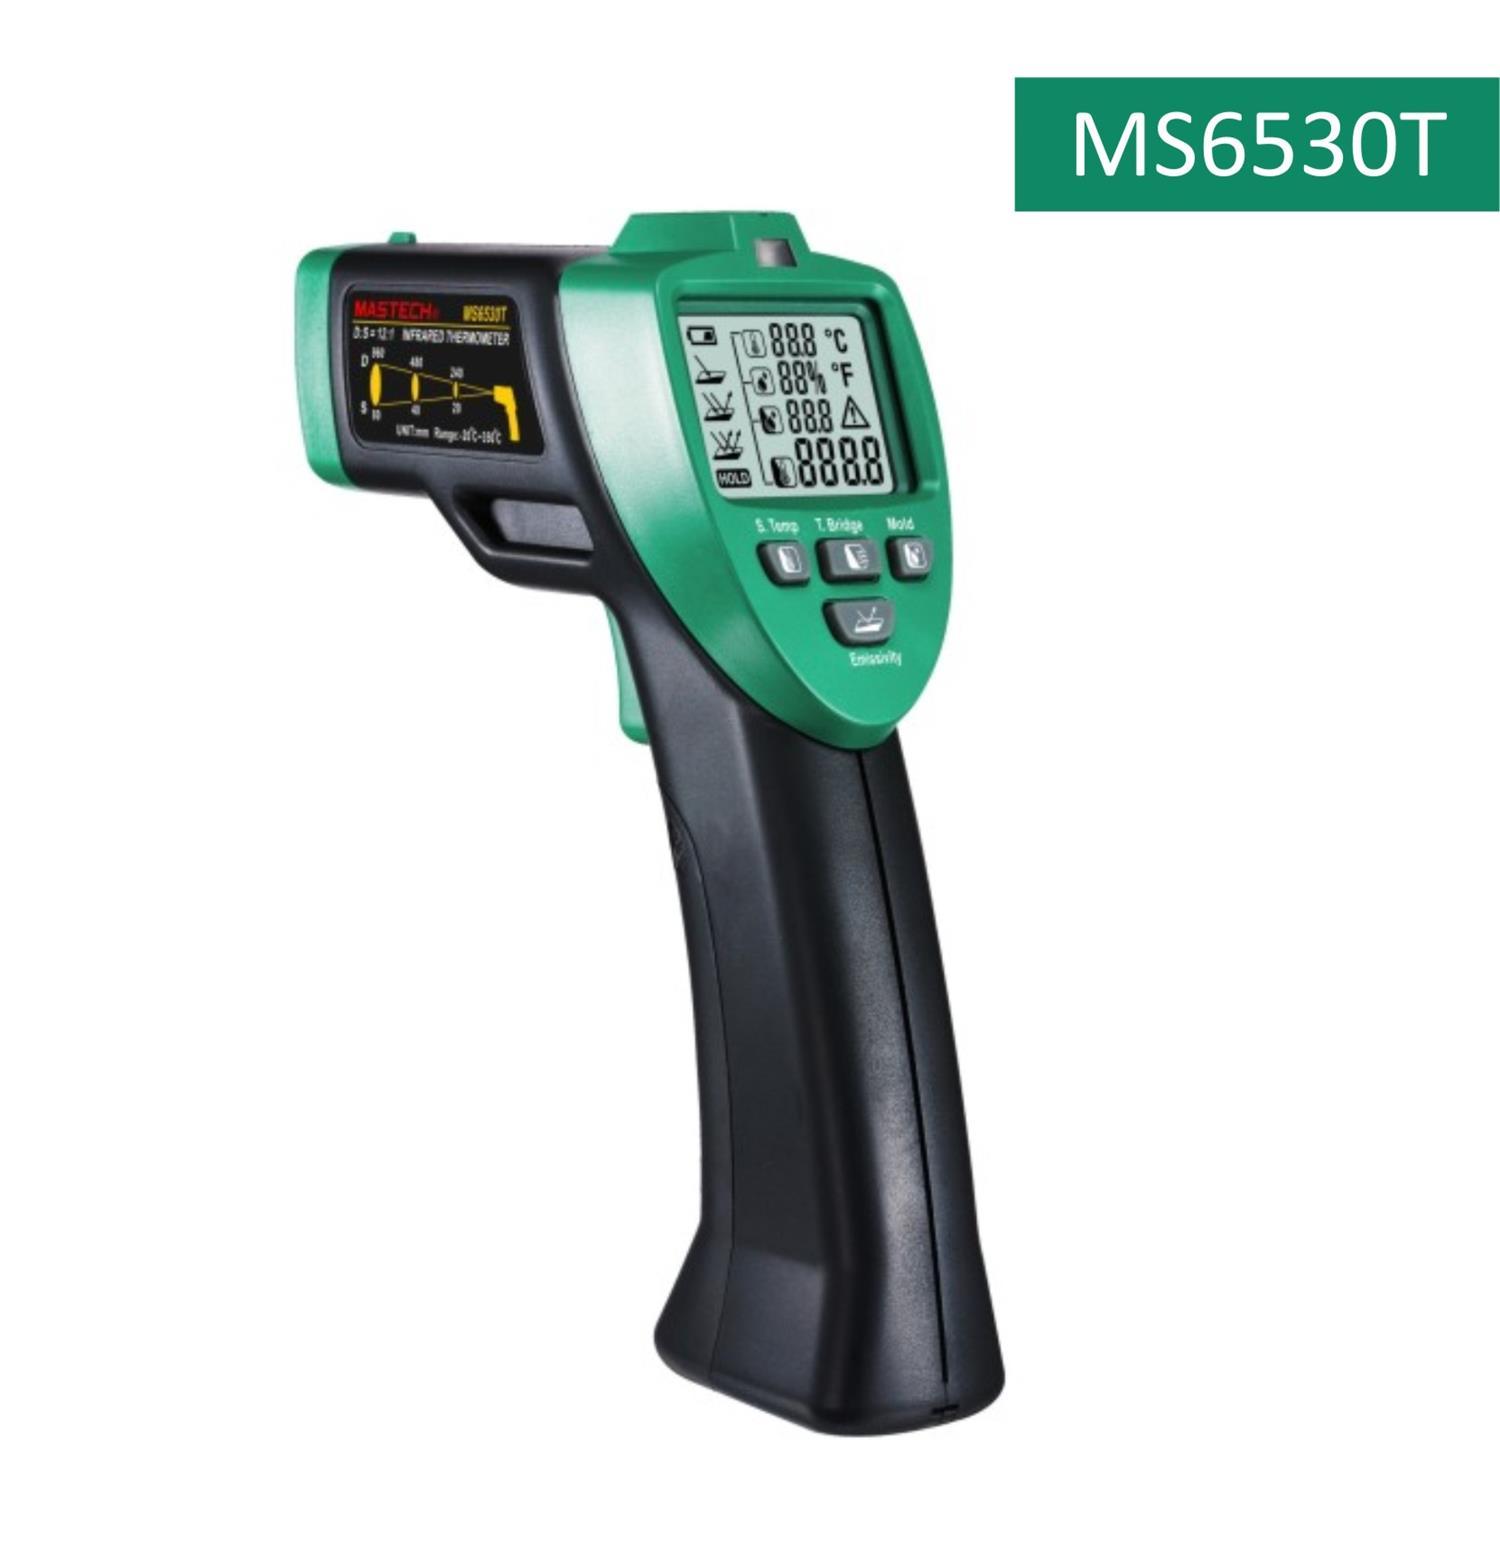 MS6530T